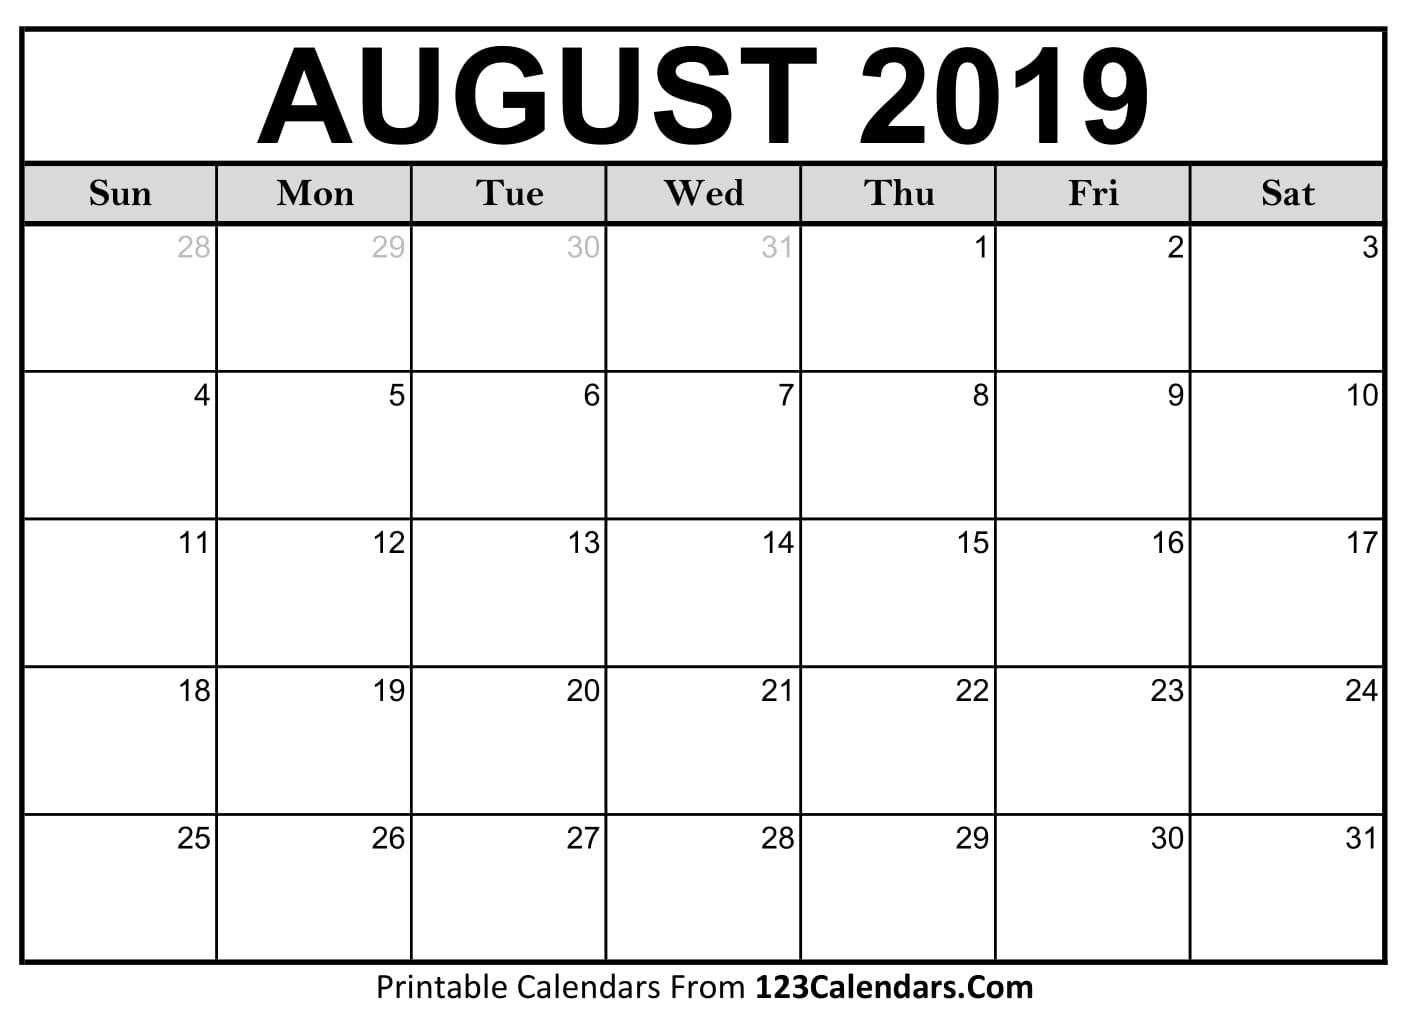 Blank August 2019 Calendar - Easily Printable - 123Calendars regarding Month Of August On A Calendar